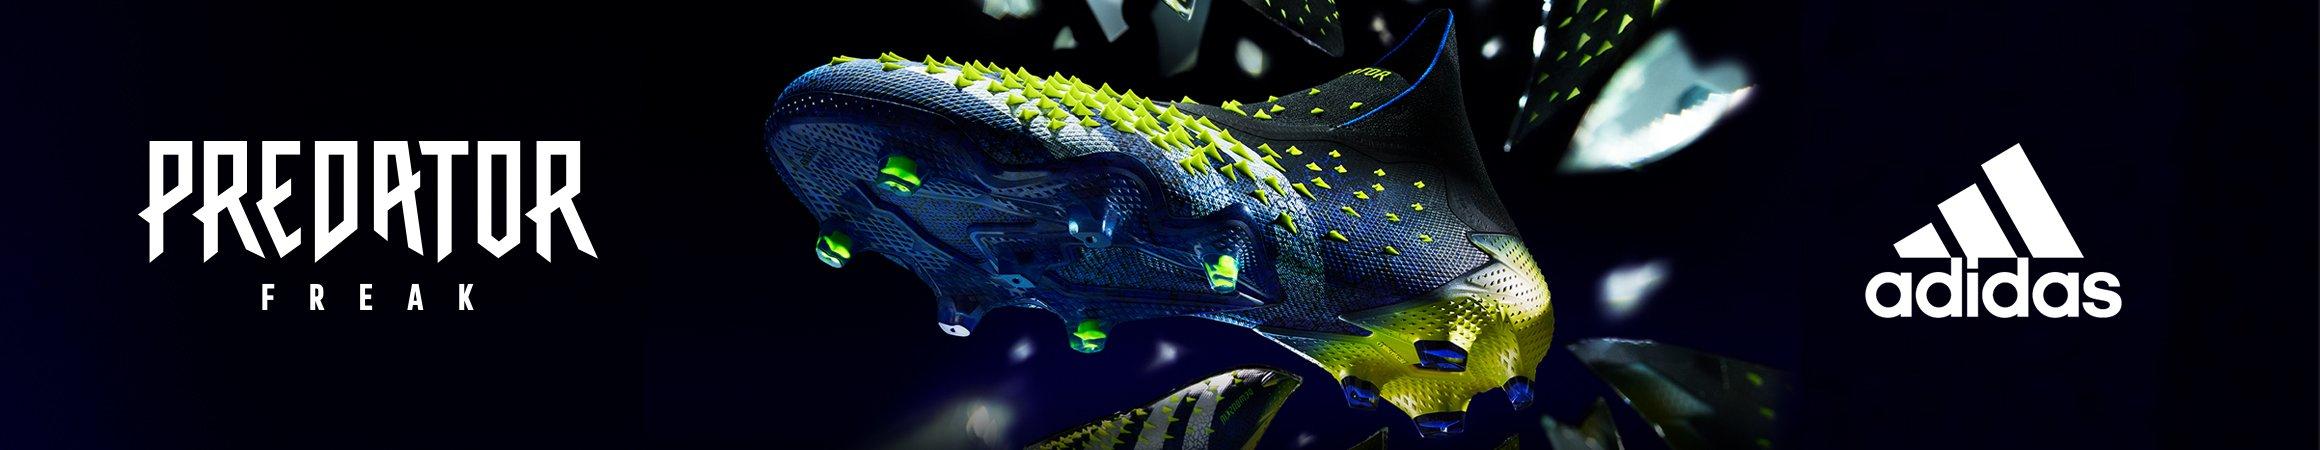 Adidas Predator Freak Superlative Pack